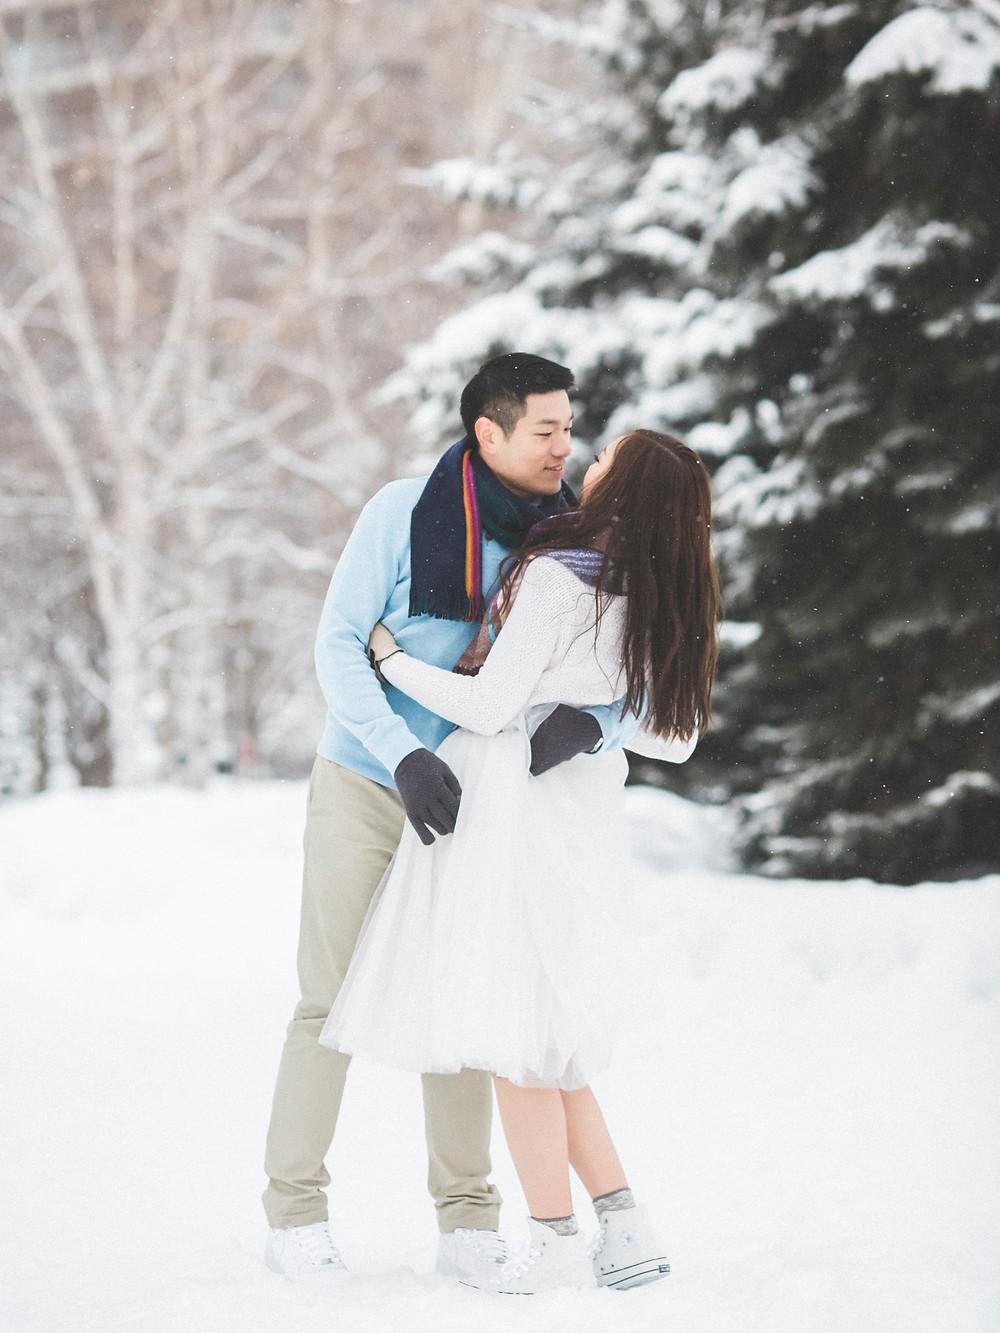 北海道婚紗 美式婚紗 Arther Chen Photography Jacqueline & KK Engagement(Pre-Wedding) in Hokkaido